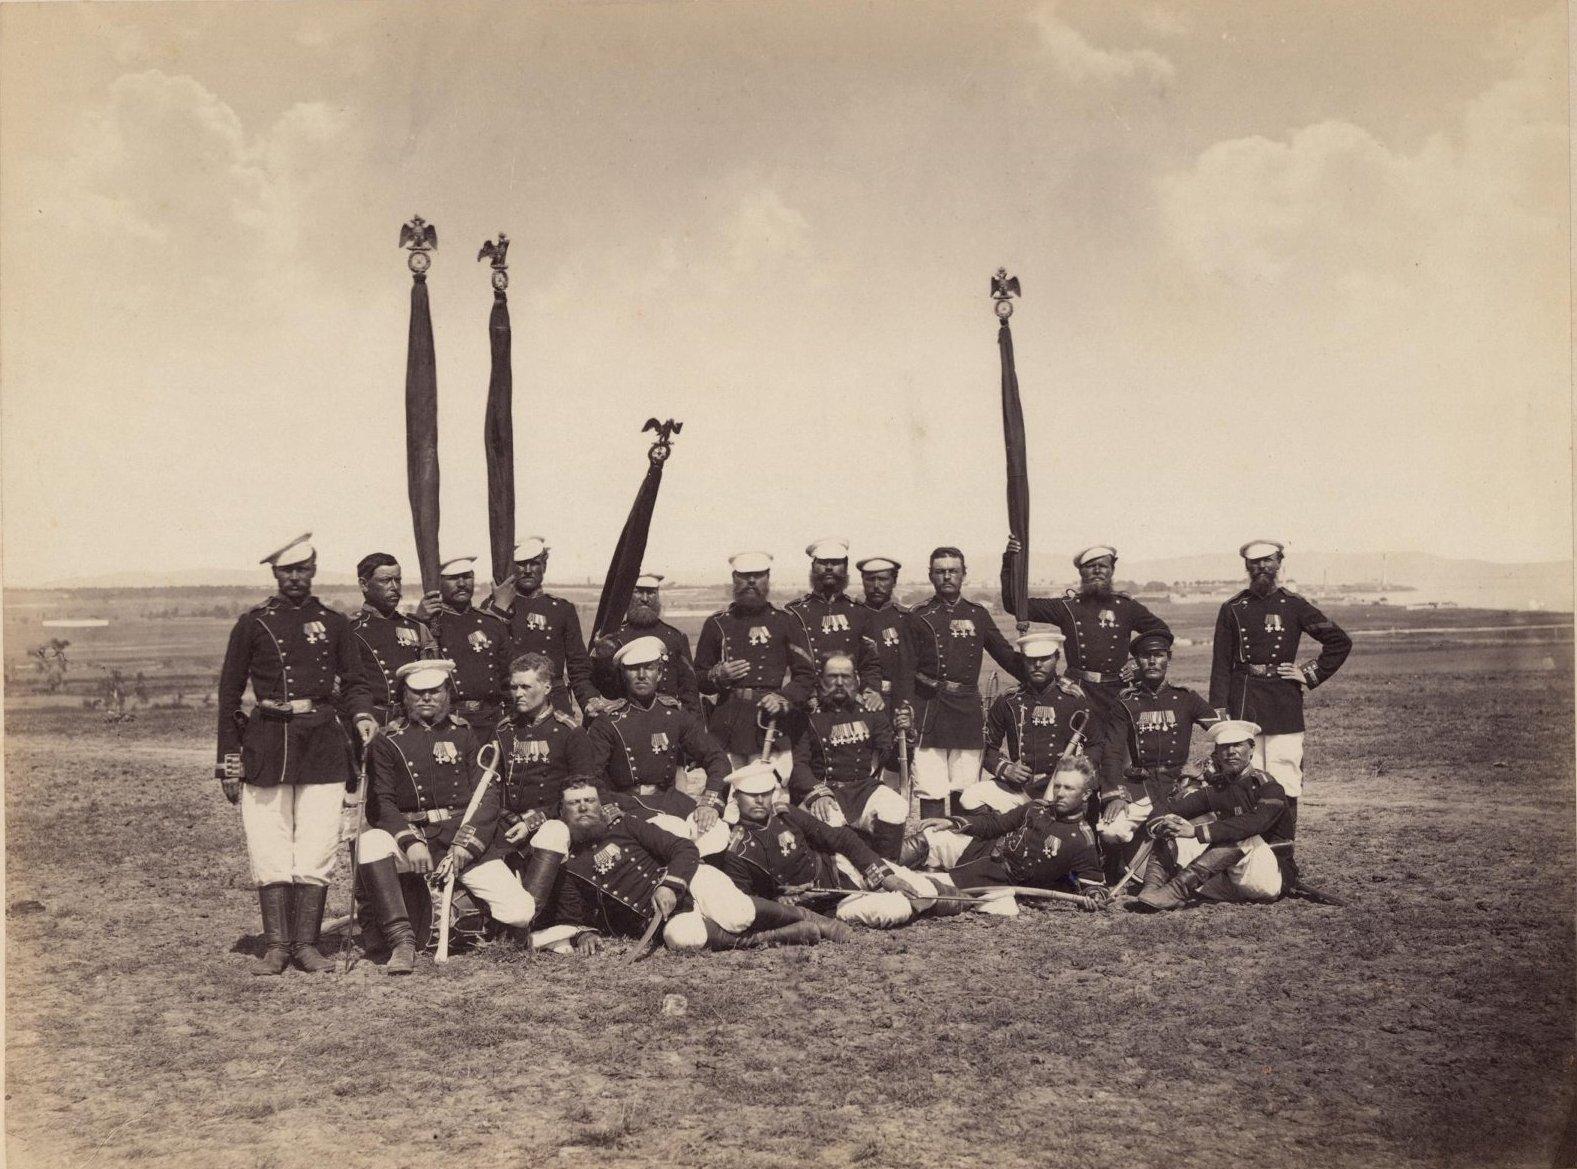 Группа егерей, снята близ Константинополя, на бивуаке у Ай-Мама. Насветович А.А. 1877-1878 гг.